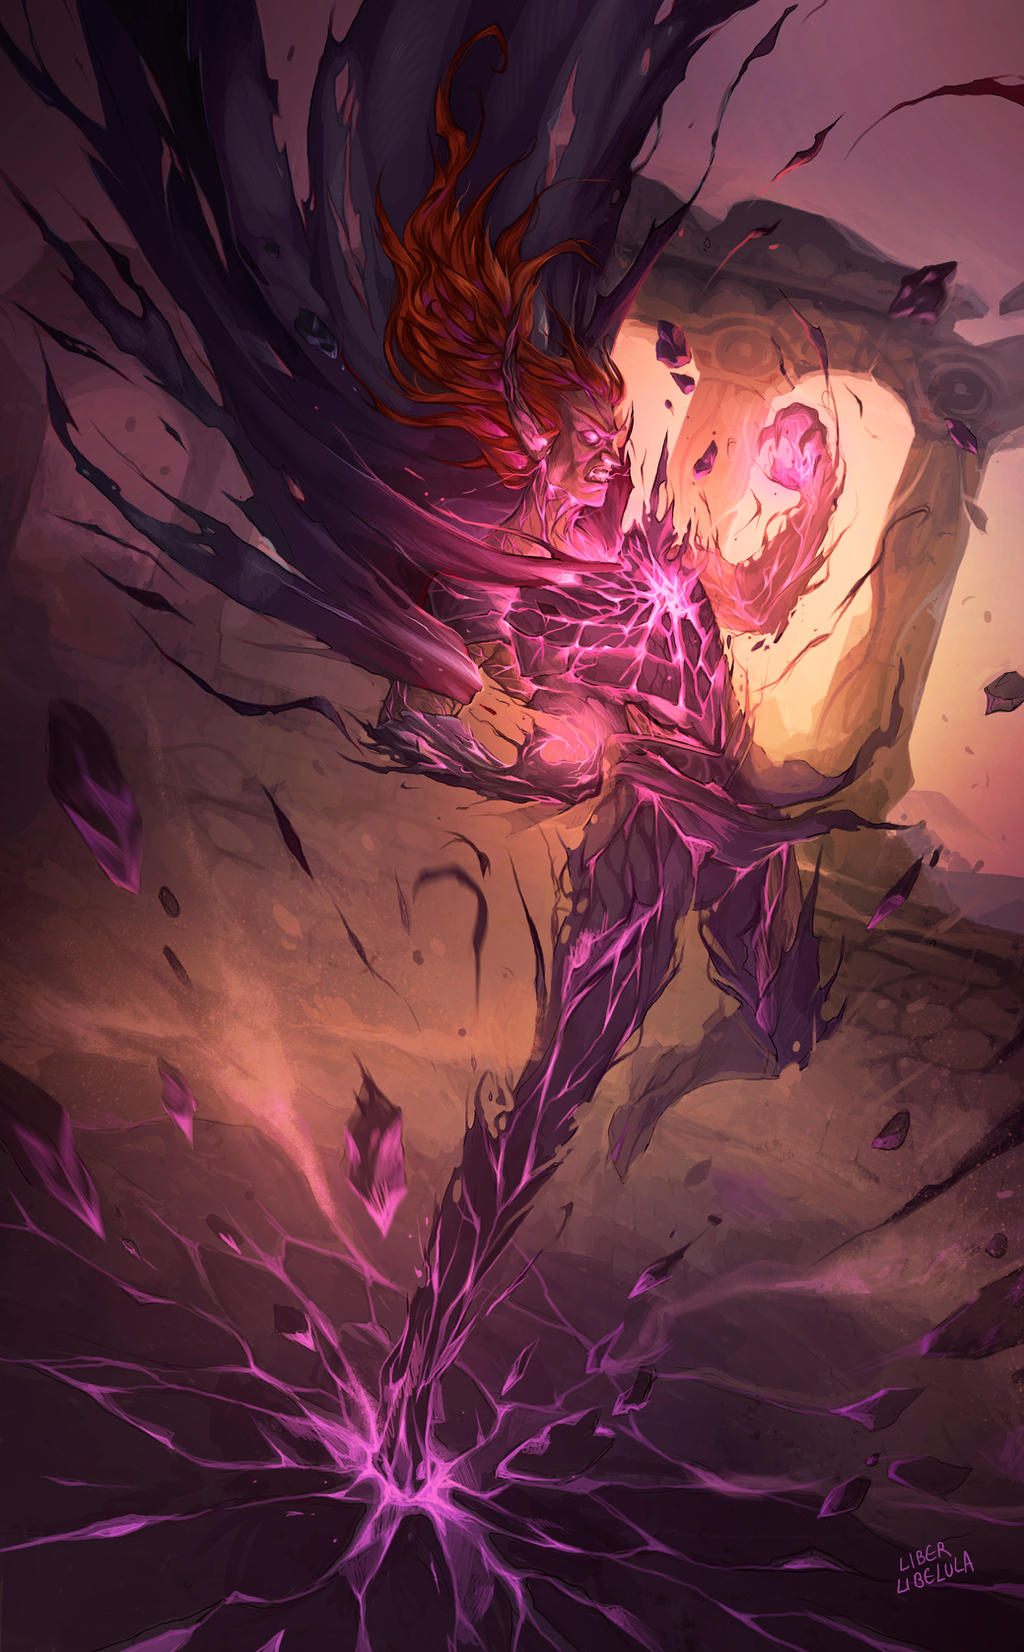 Commission - Aratheo's doom by LiberLibelula